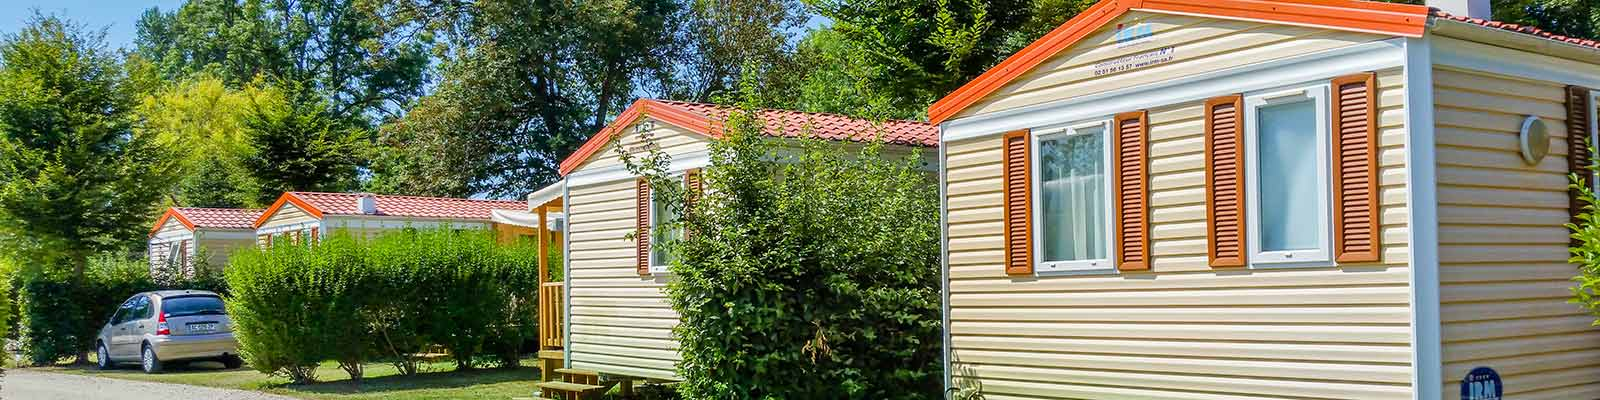 Camping avec mobil homes en Dordogne